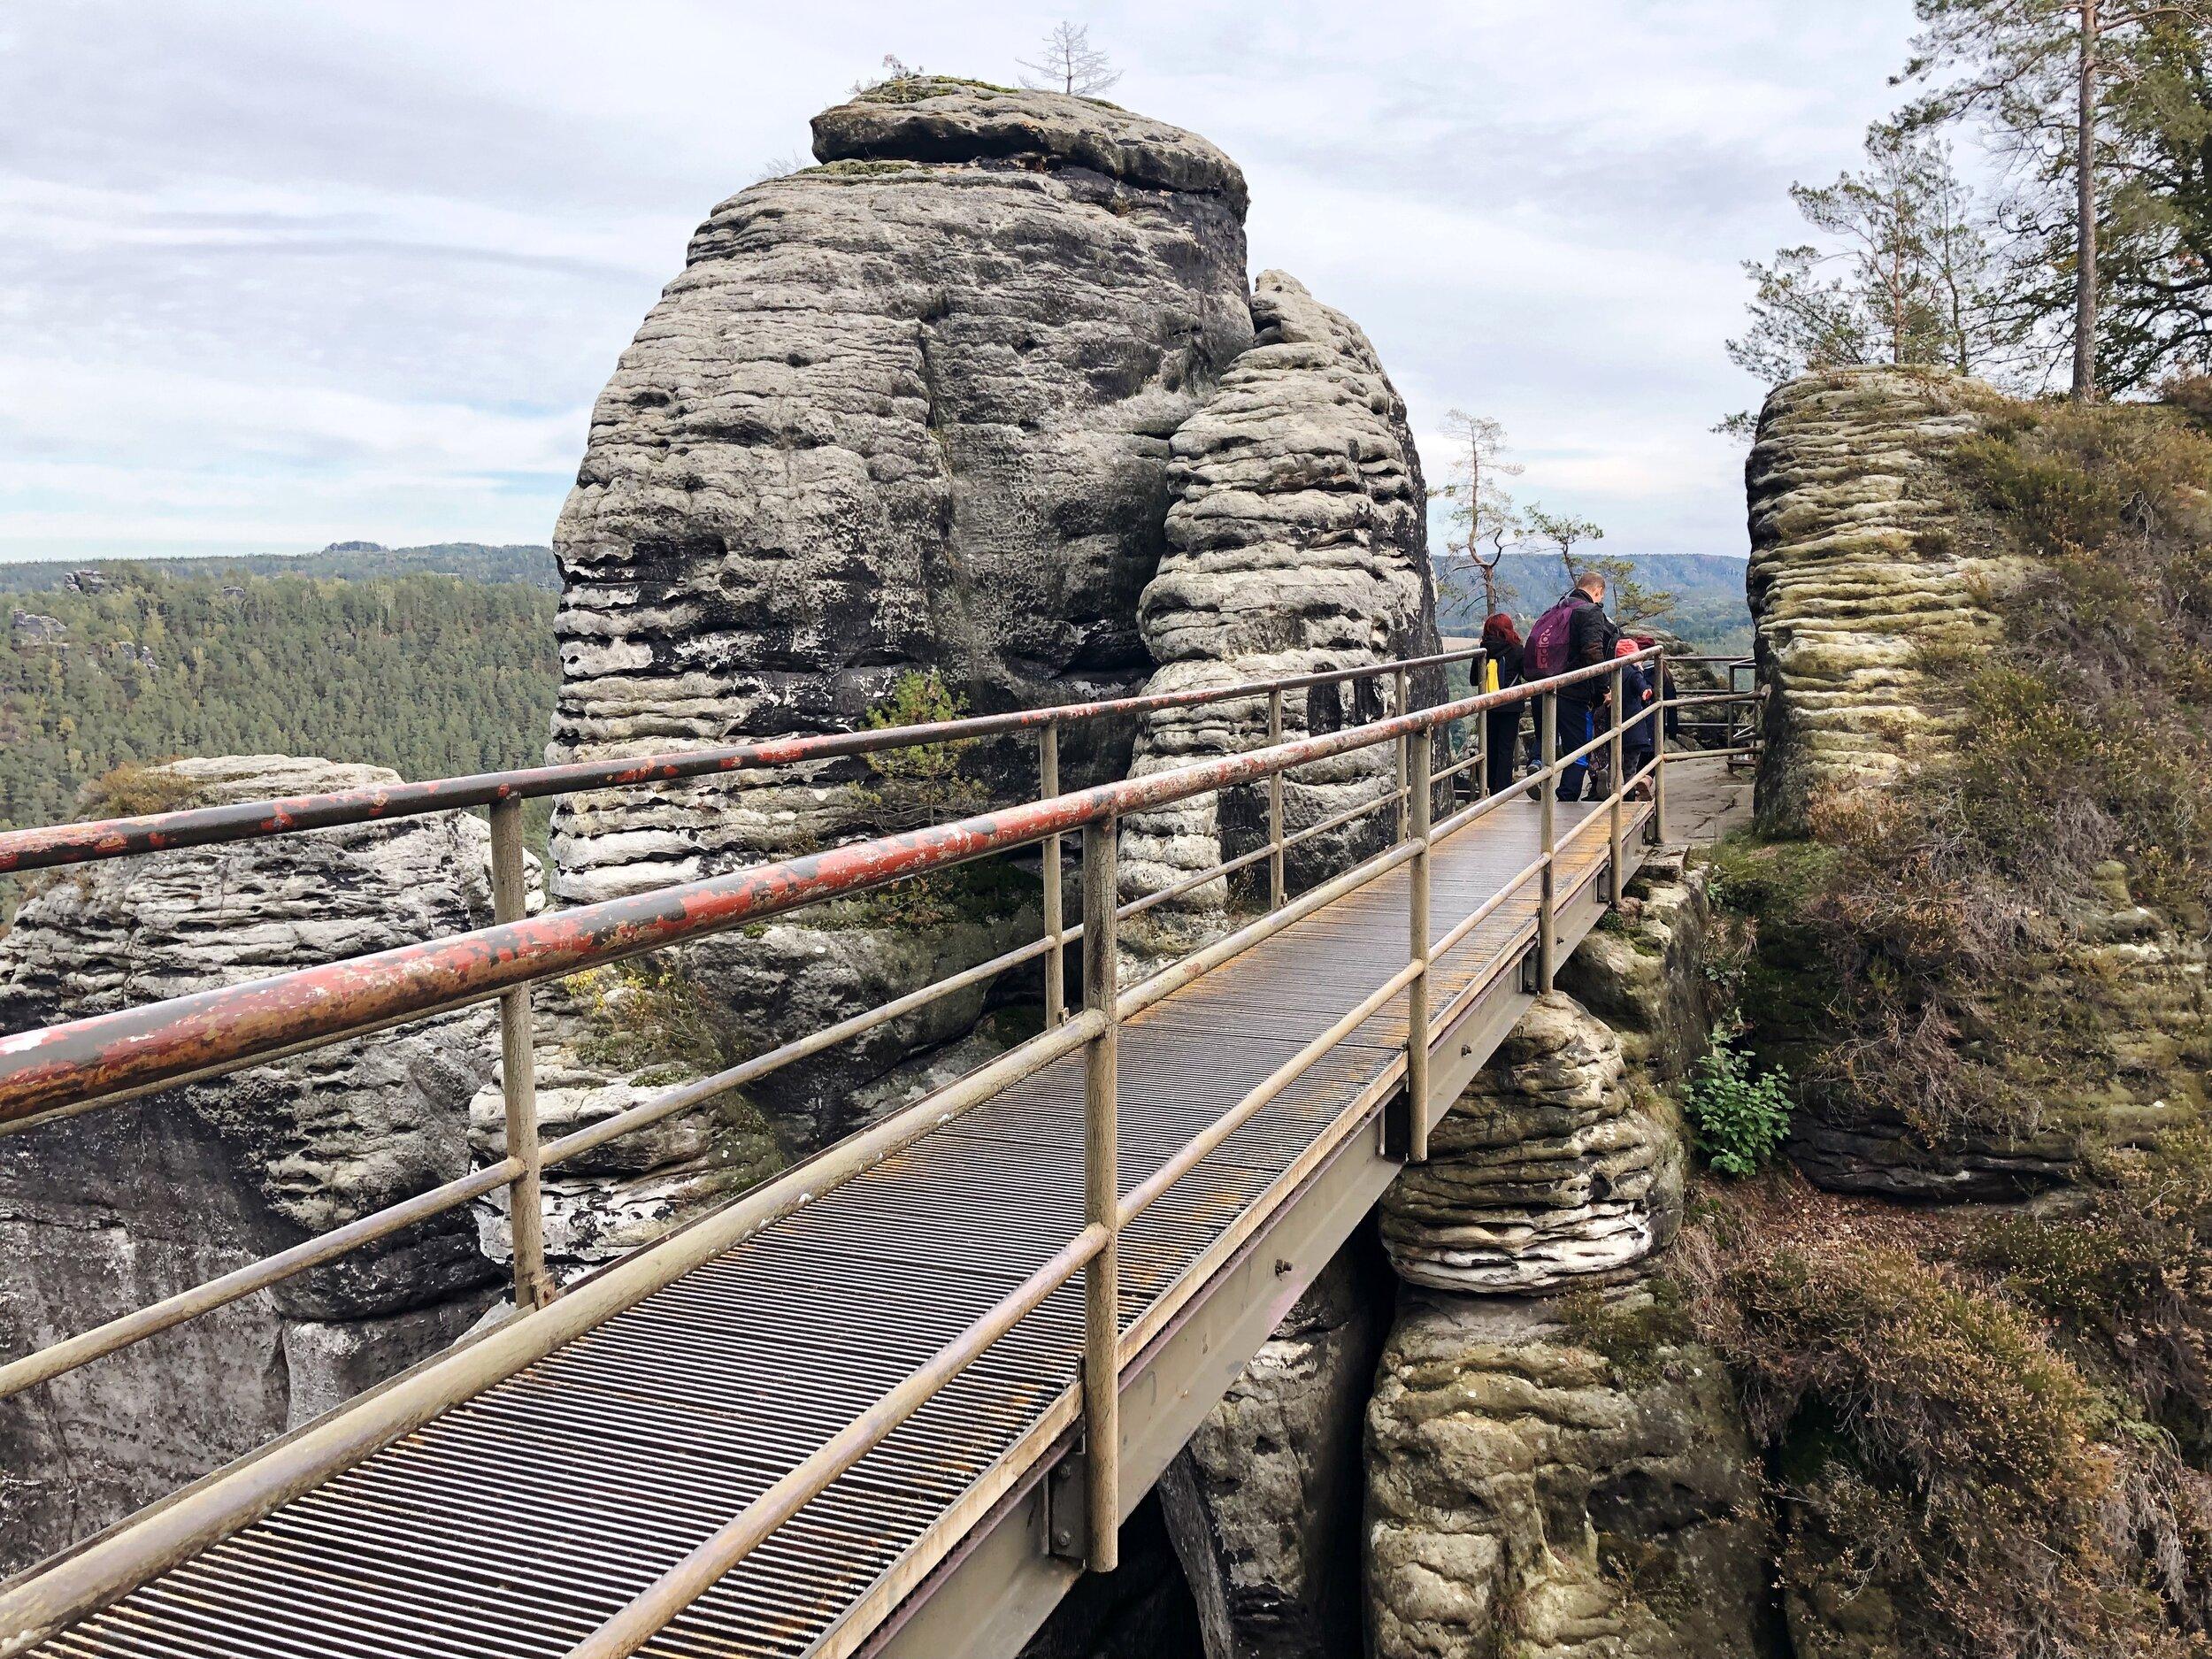 baste-bridge-lohmen-germany-hiking_0324.JPG